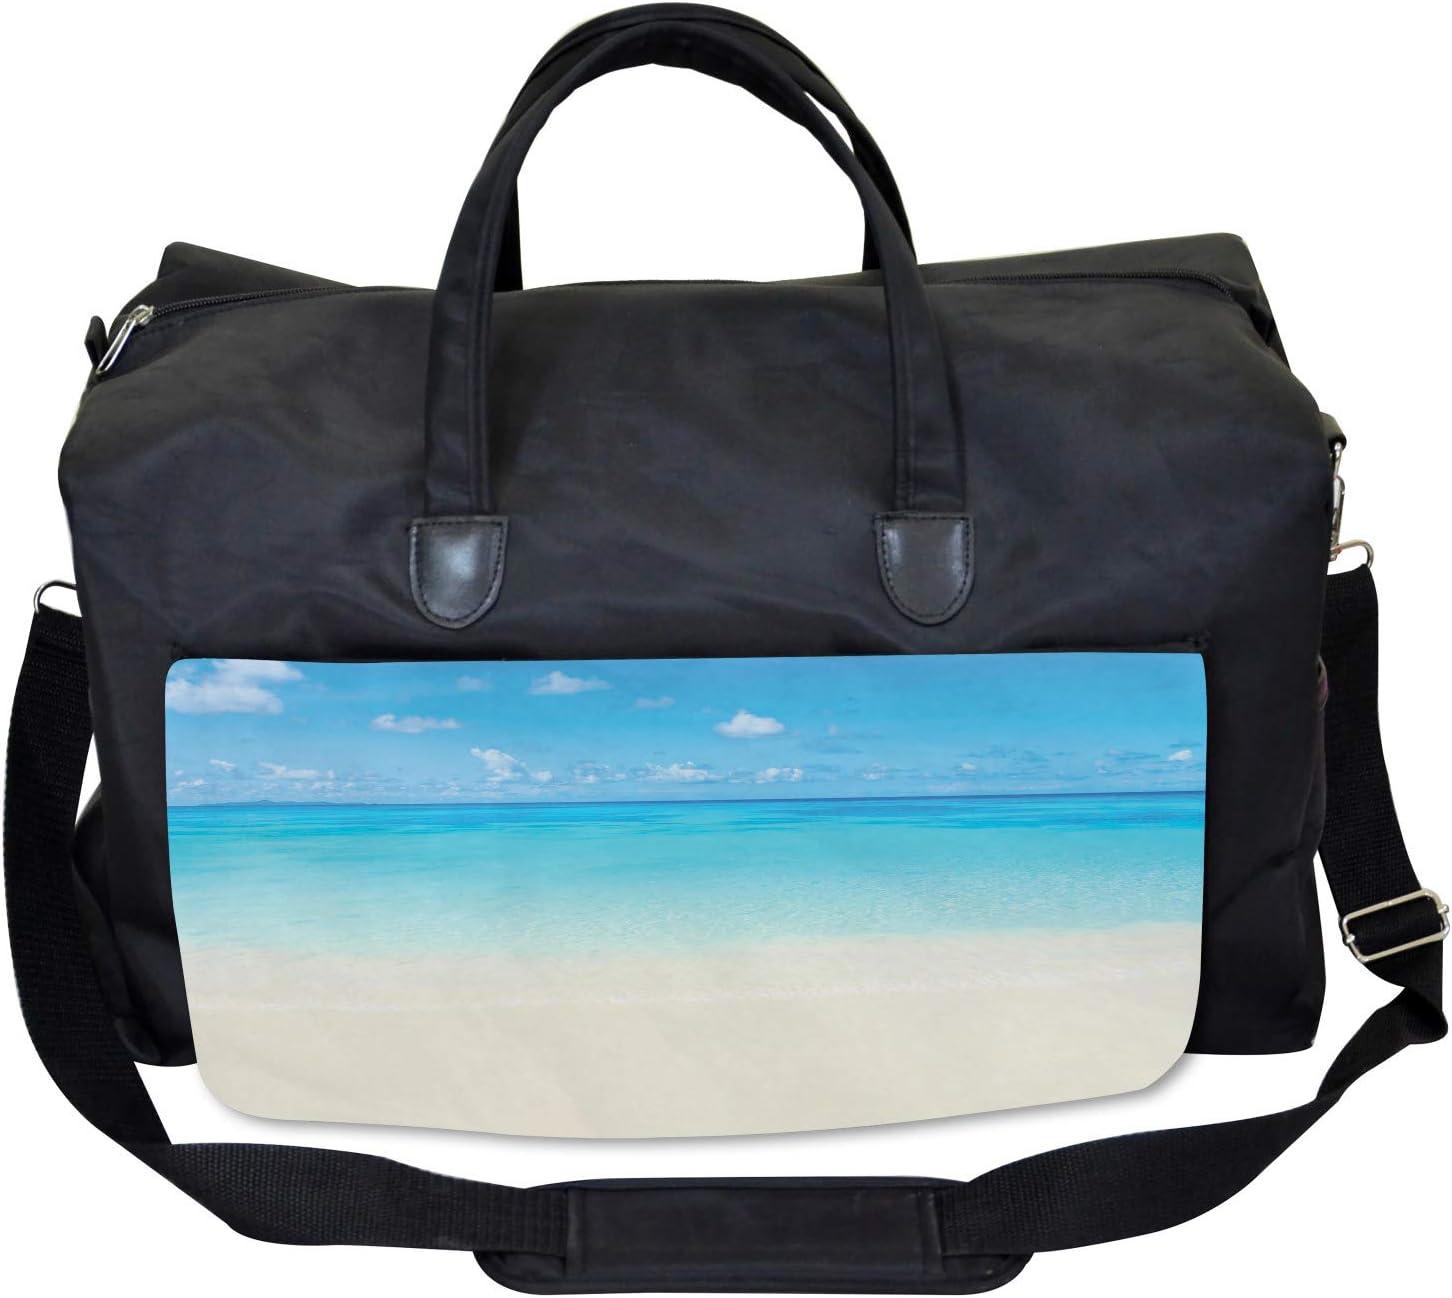 Ambesonne Tropical Gym Bag Large Weekender Carry-on Carribean Sea Beach